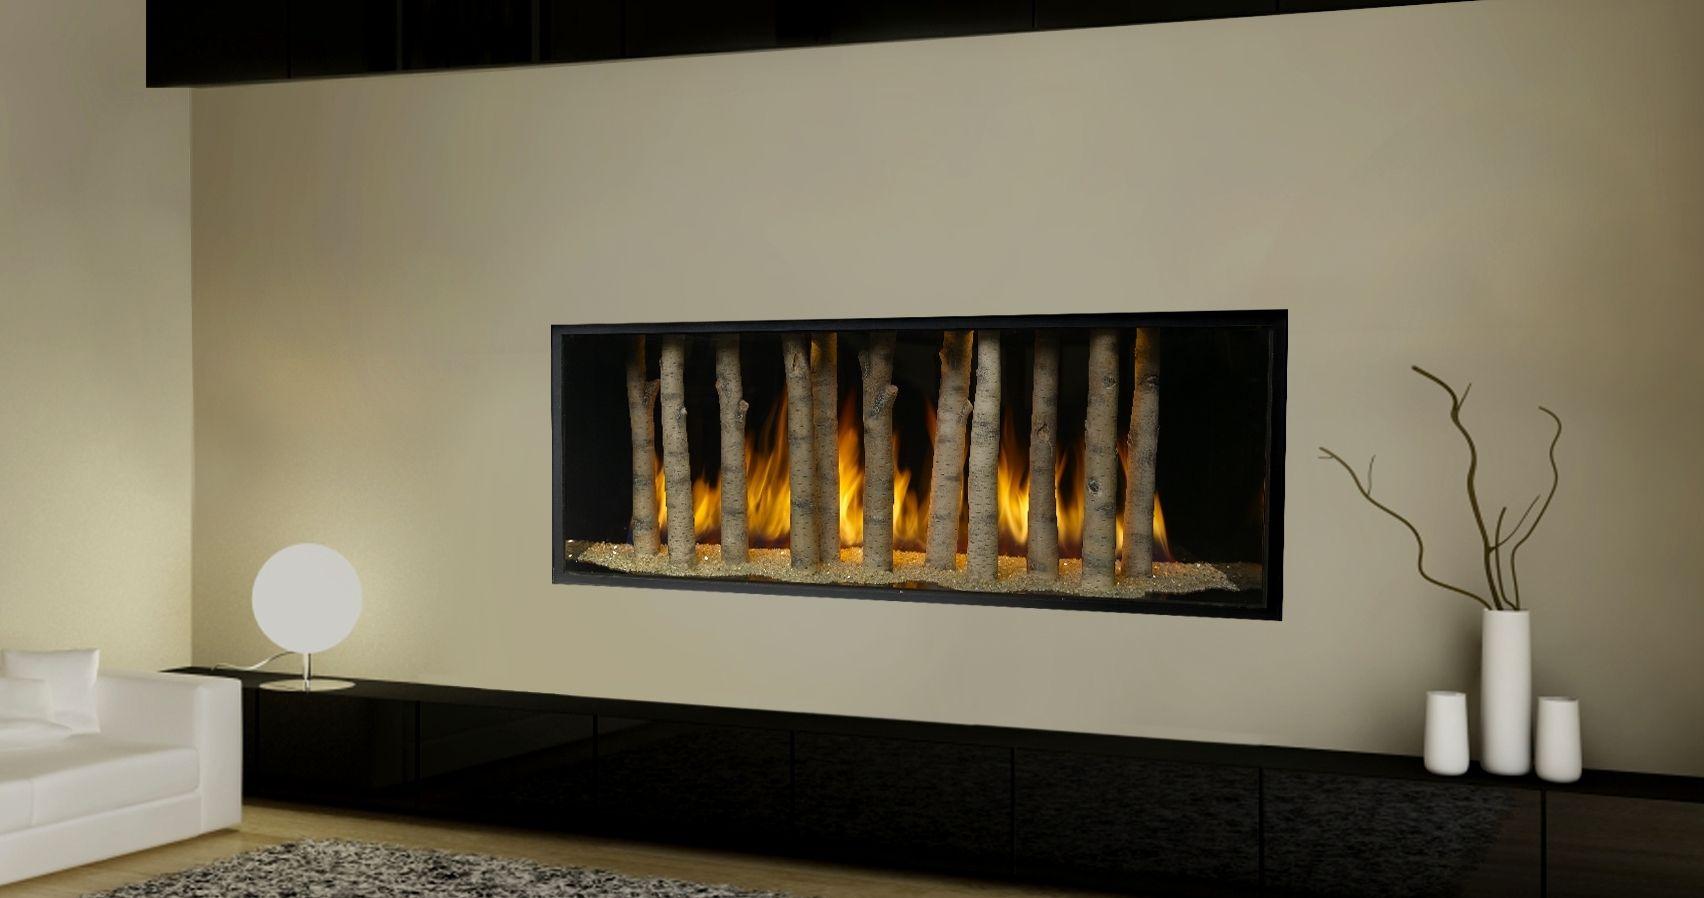 Xtreme Fireplace Xtreme 6020 Gas Fireplace By Fireplace